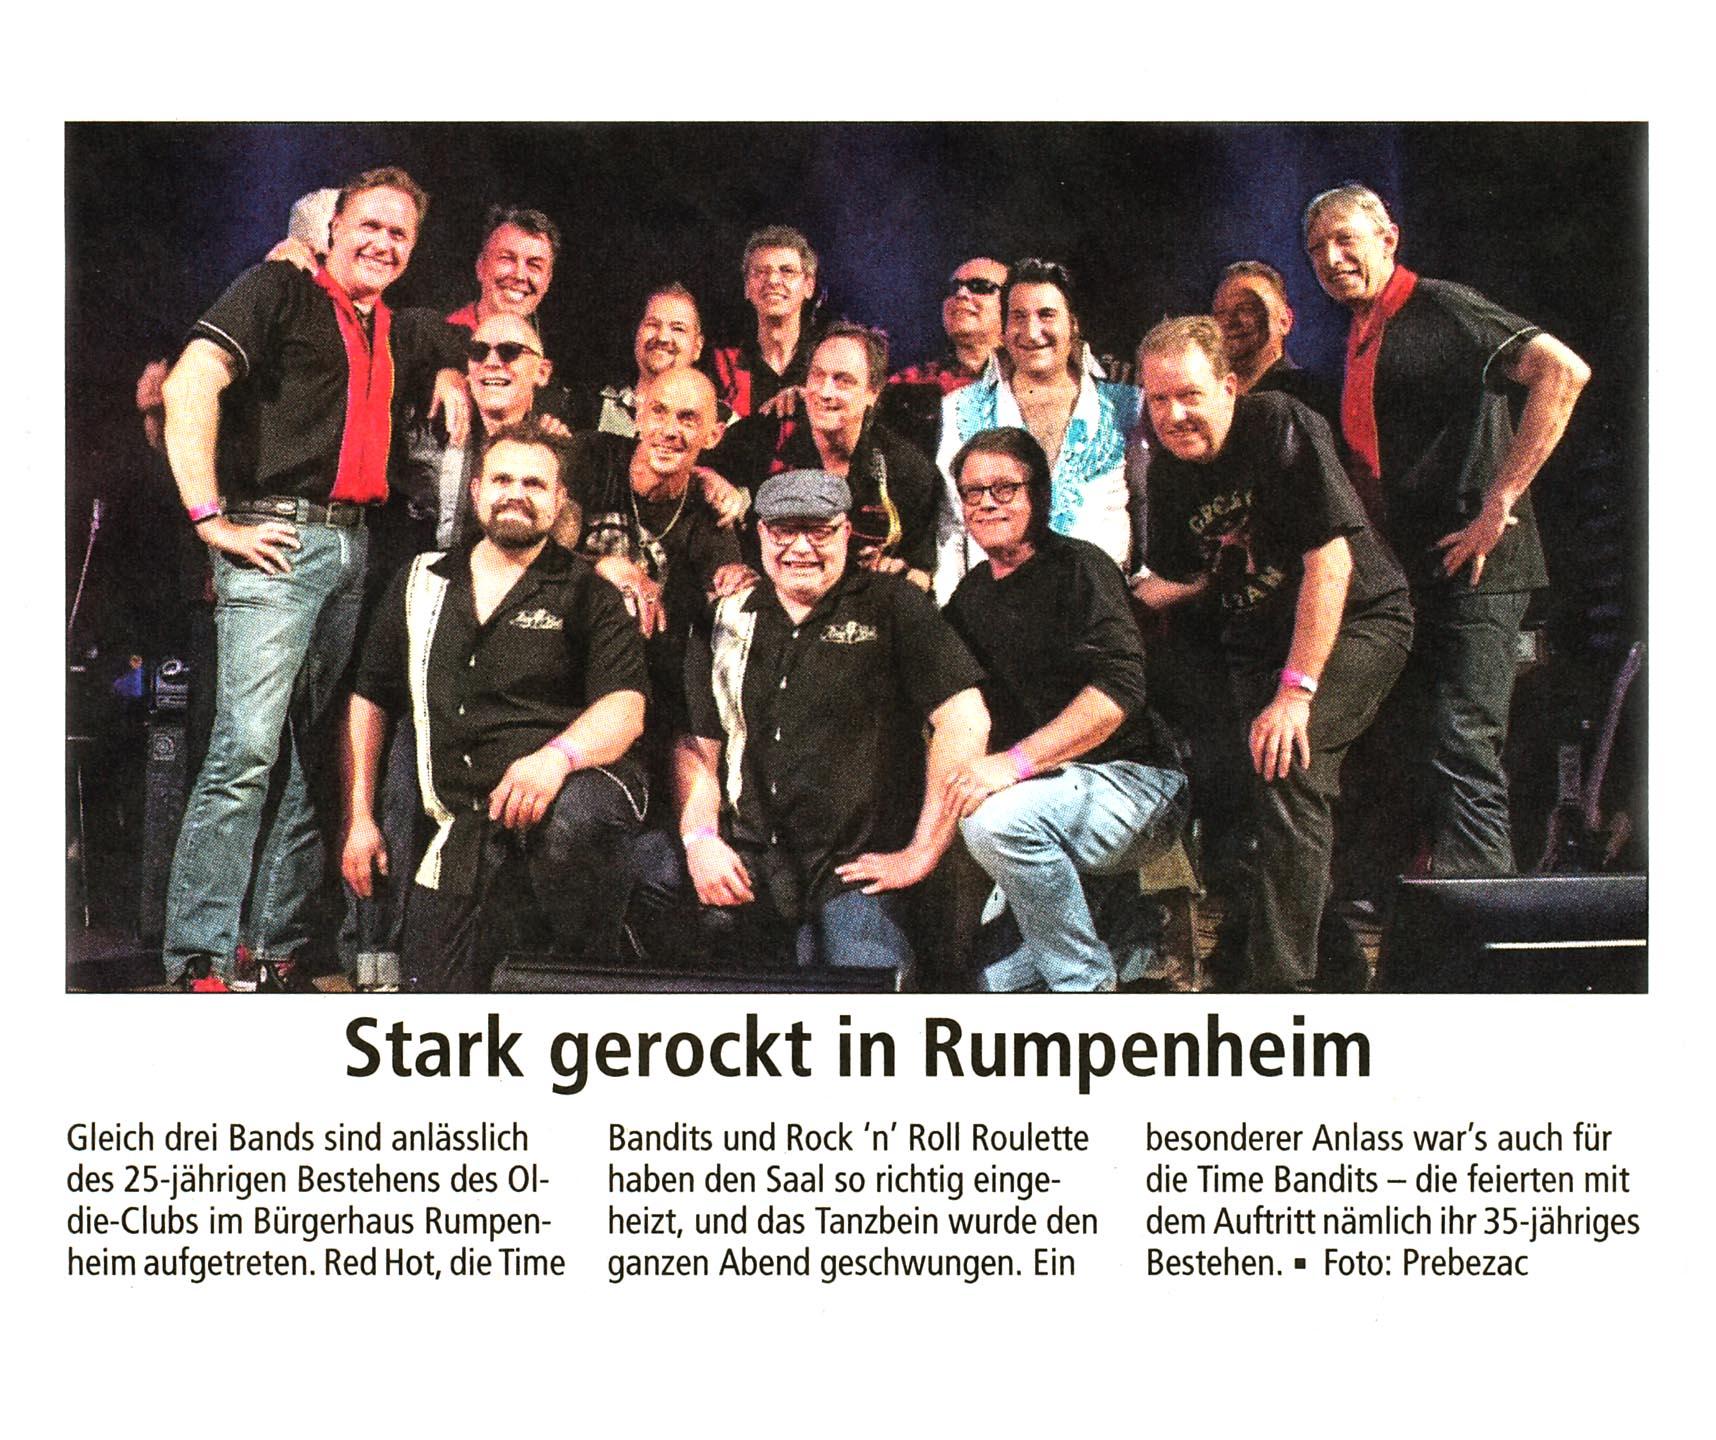 Offenbach Post, 2. Mai 2018